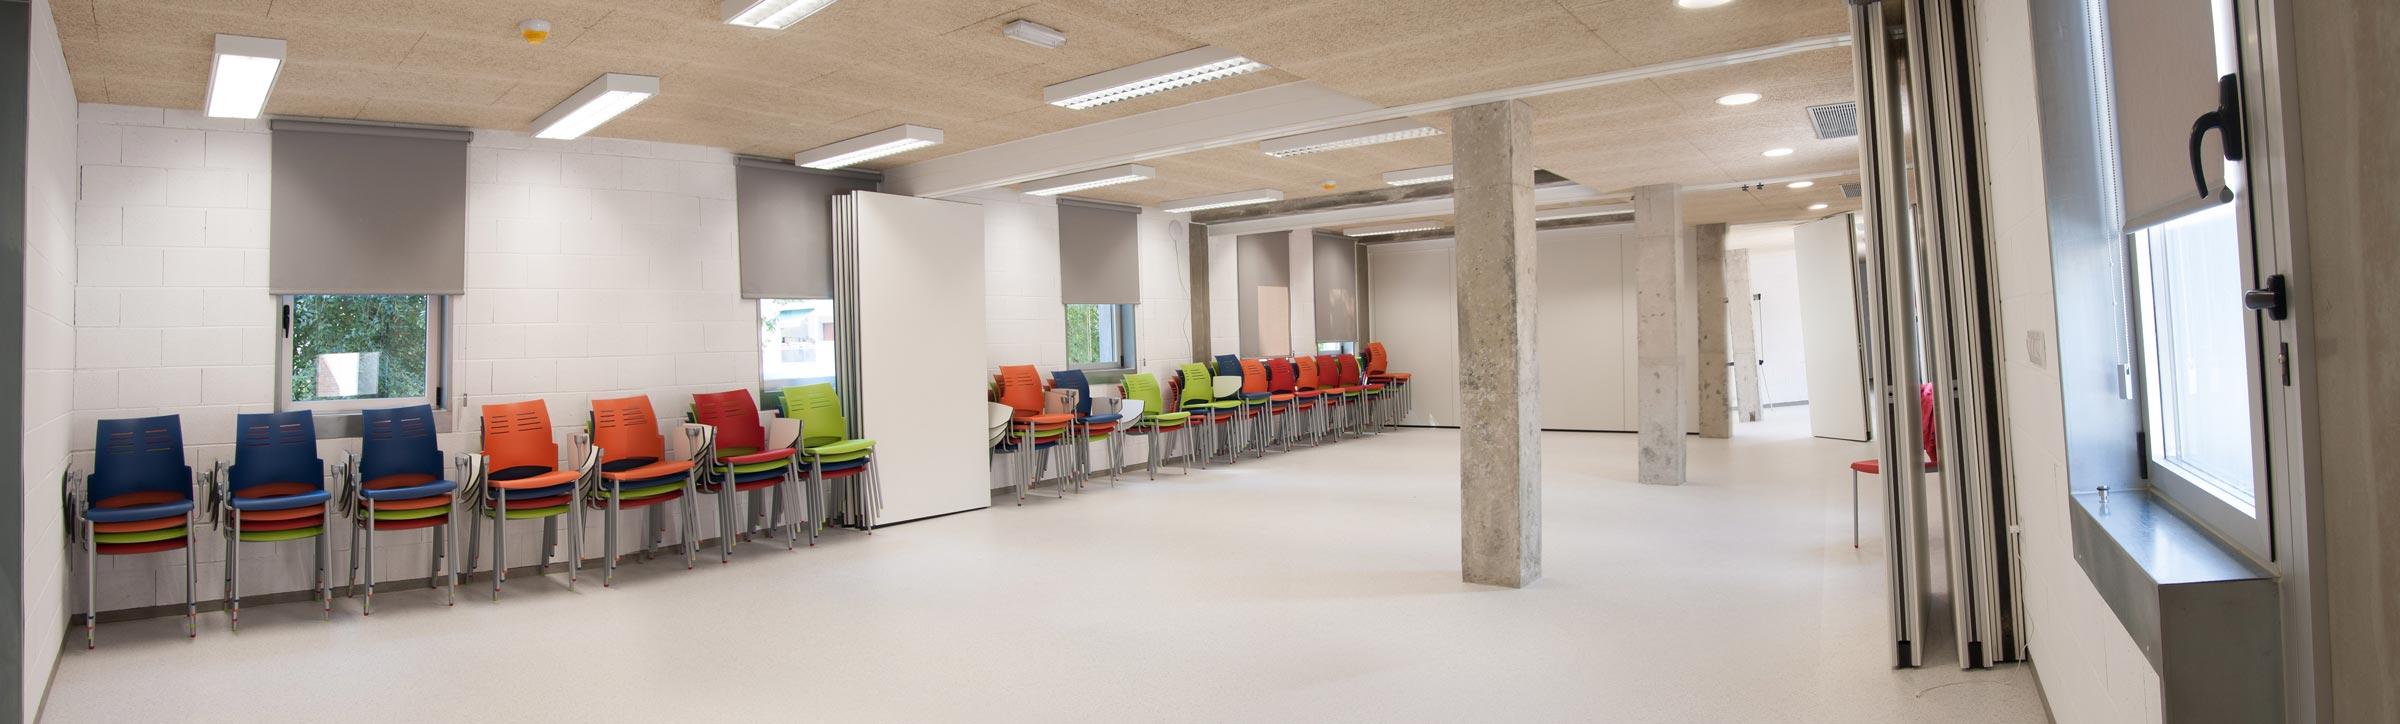 Sala panelable Scout Madrid Hostel